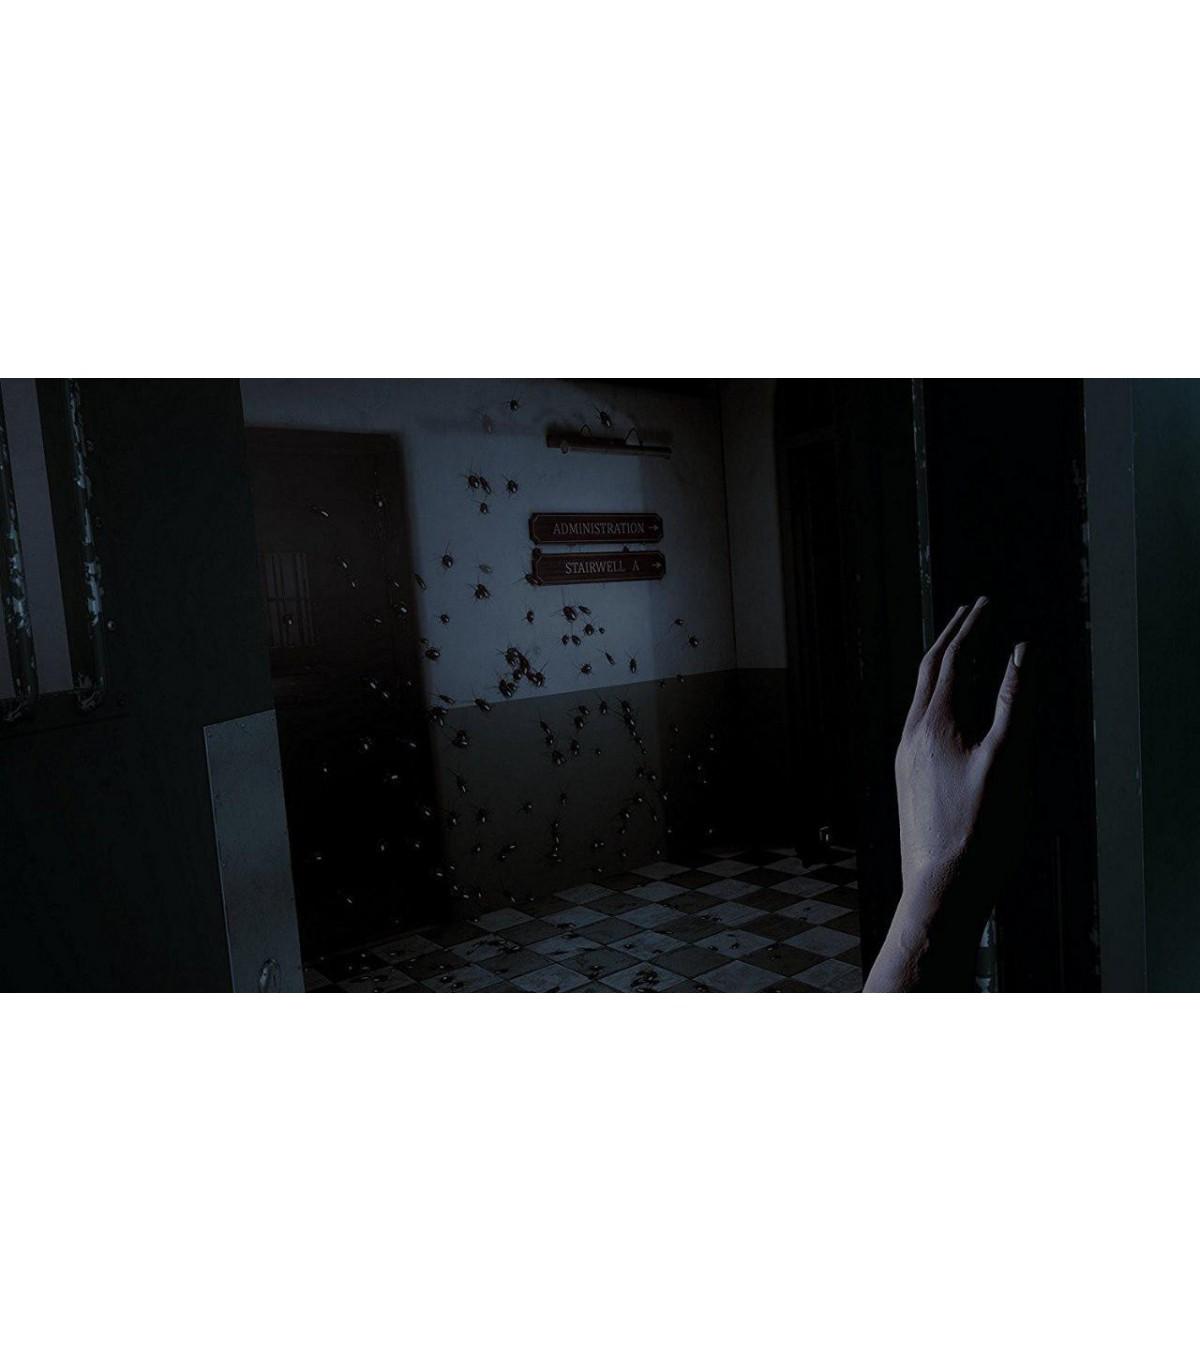 بازی The Inpatient - پلی استیشن VR